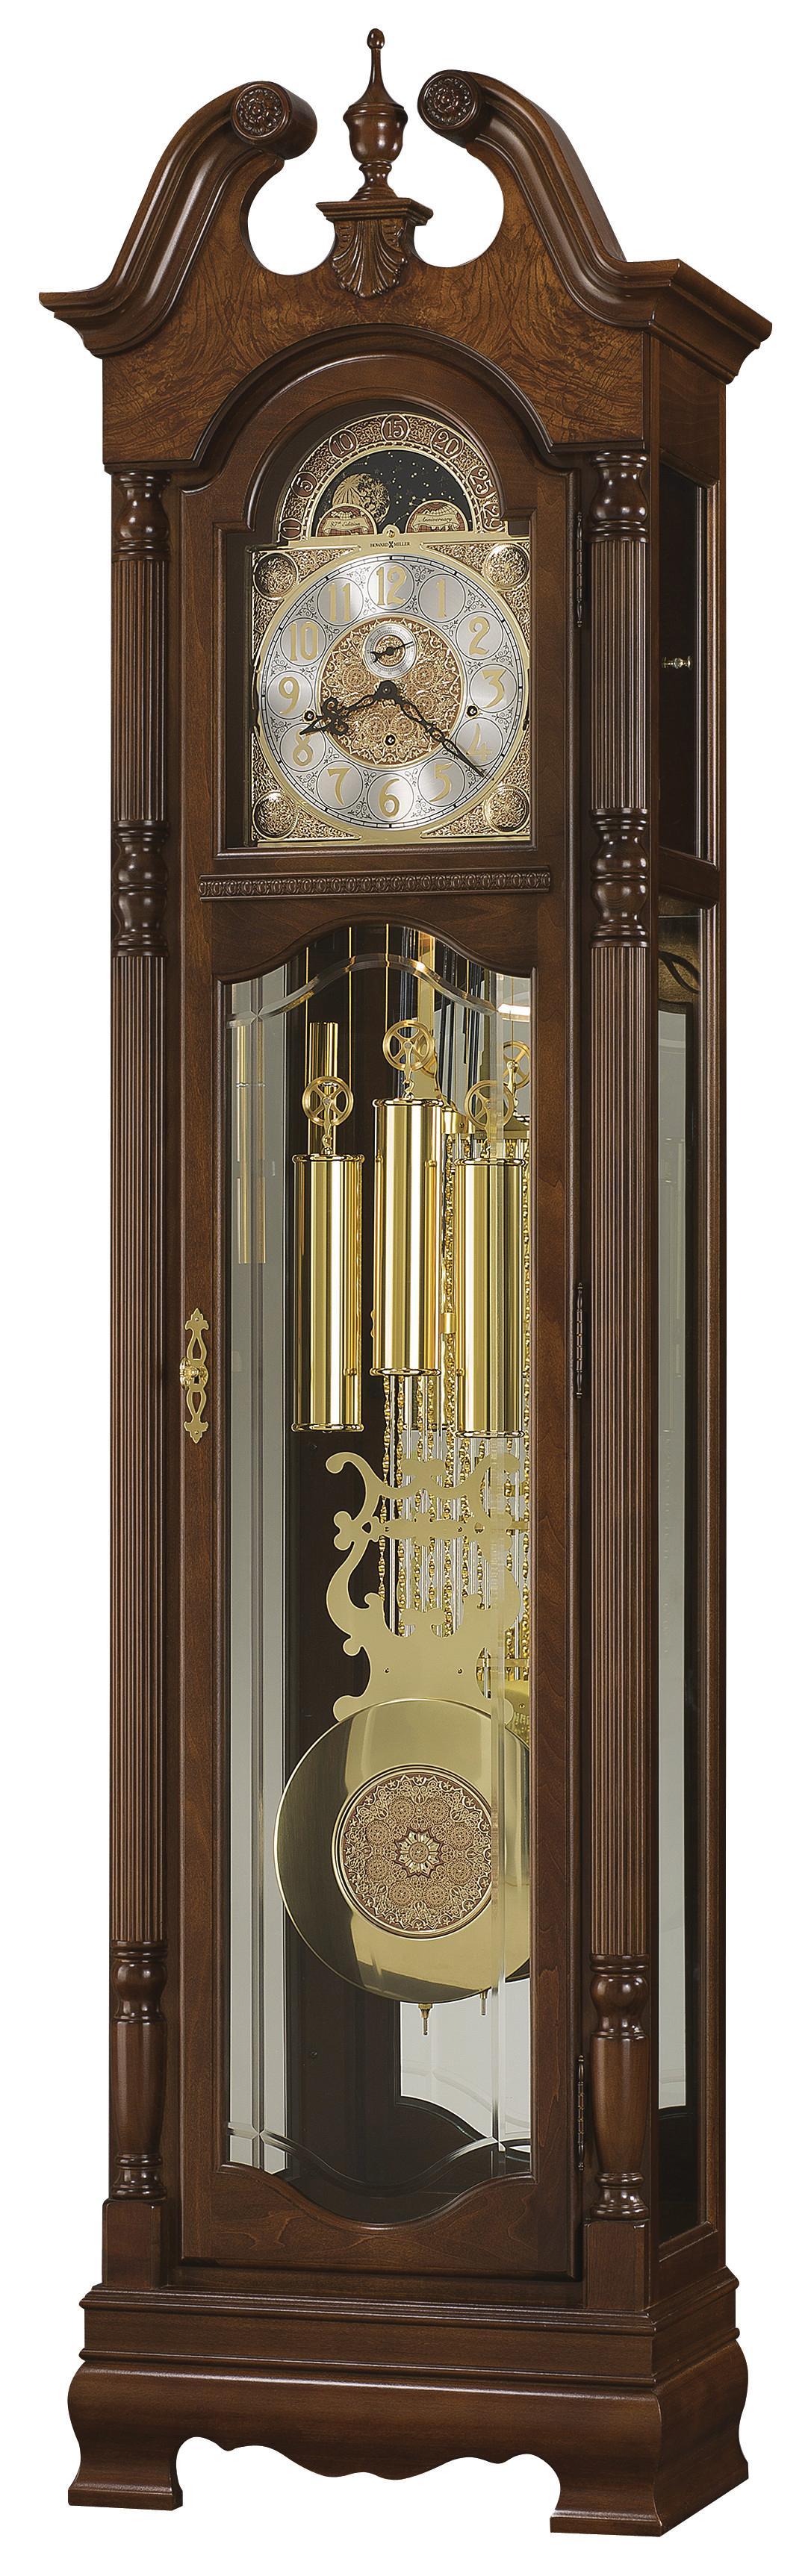 Clocks Baldwin by Howard Miller at Alison Craig Home Furnishings